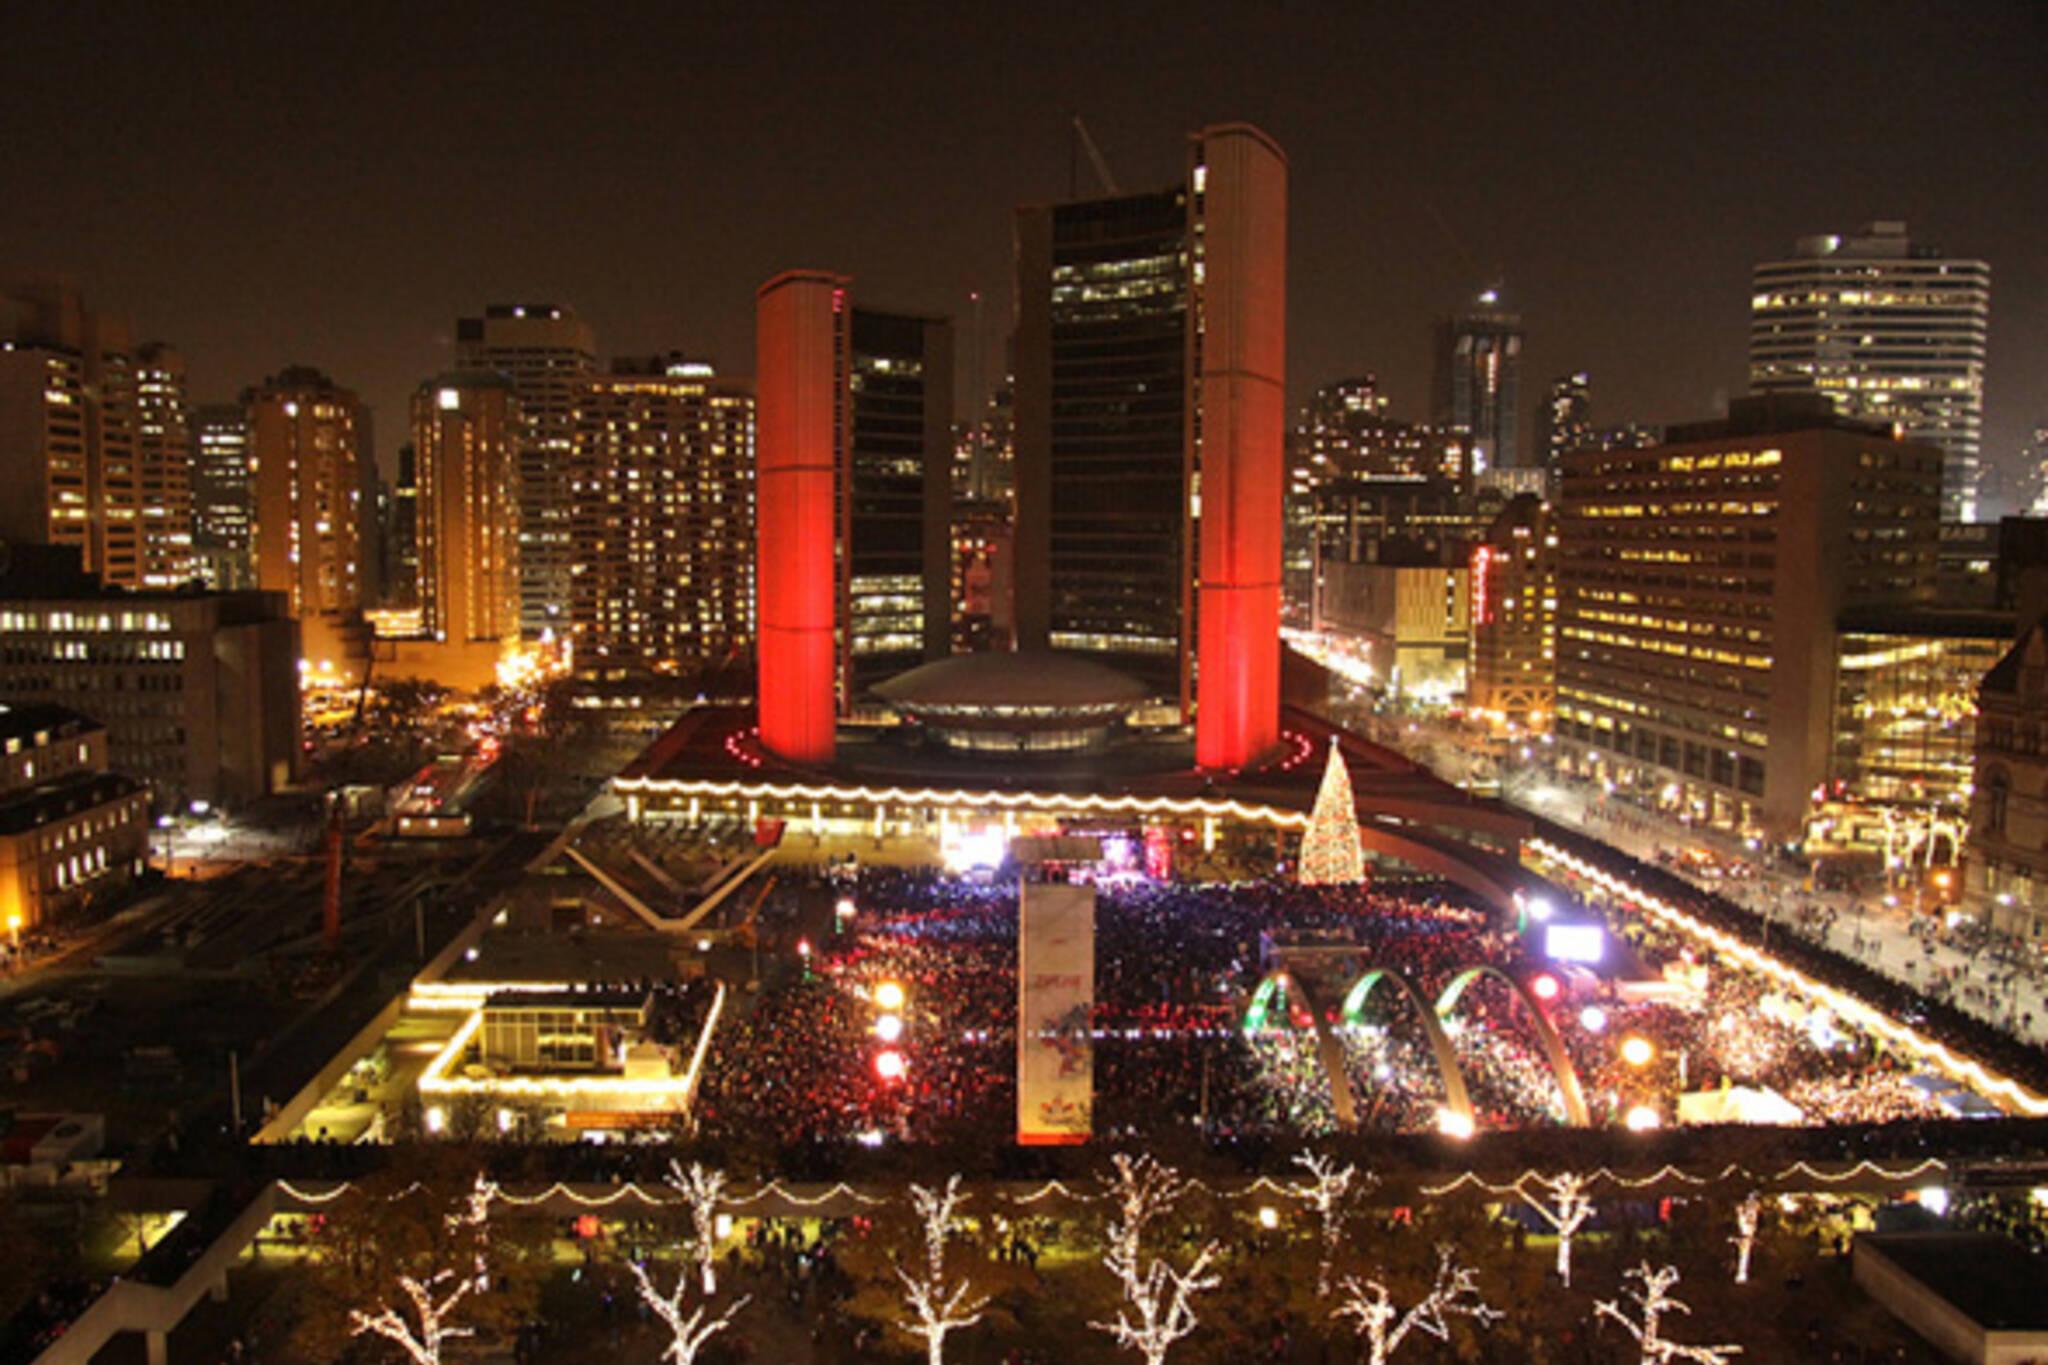 Cavalcade of Lights 2012